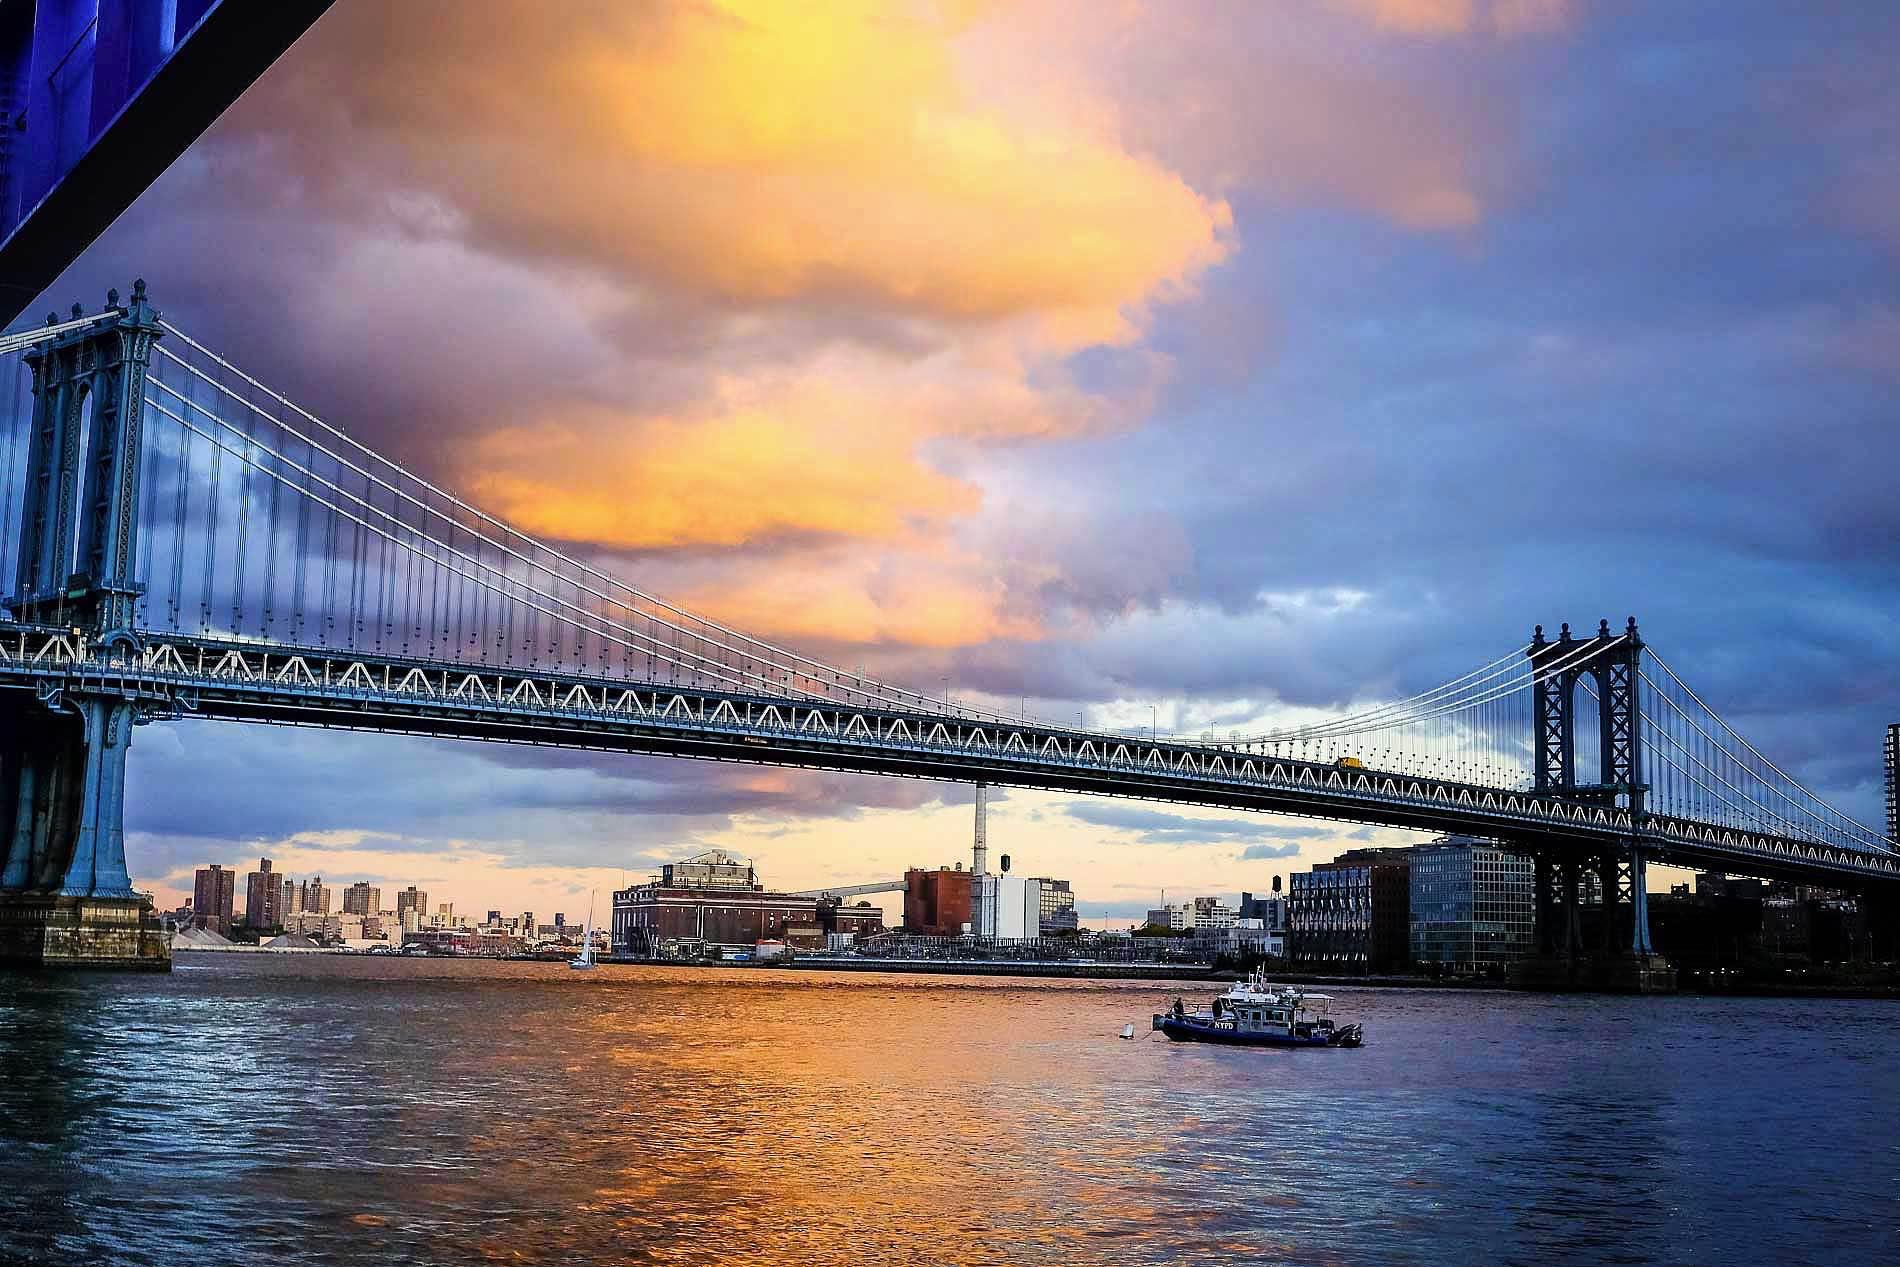 reportage_travel_newyork_martinfrick-5095